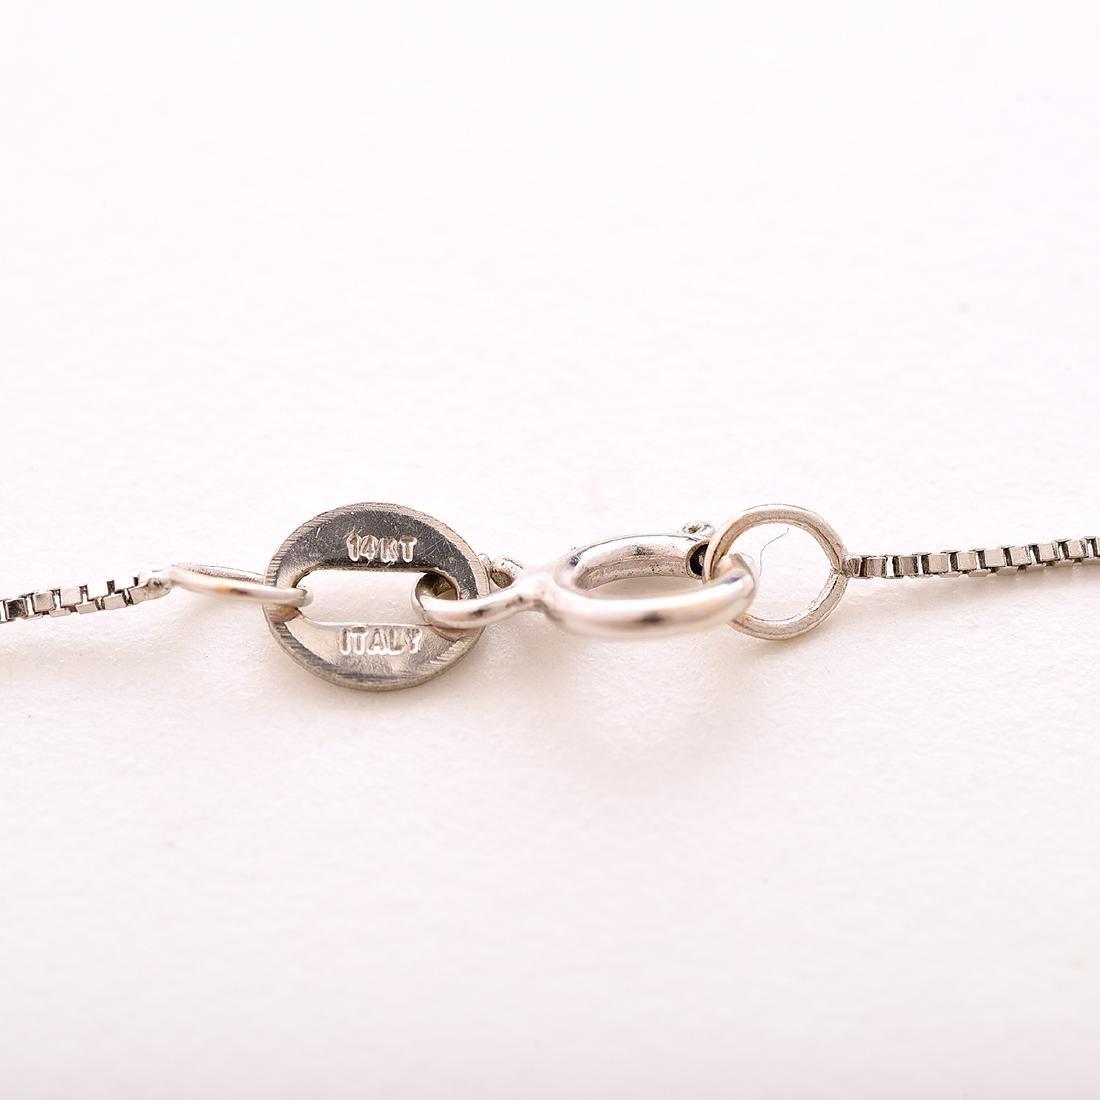 Diamond, 14k White Gold Pendant Necklace. - 4